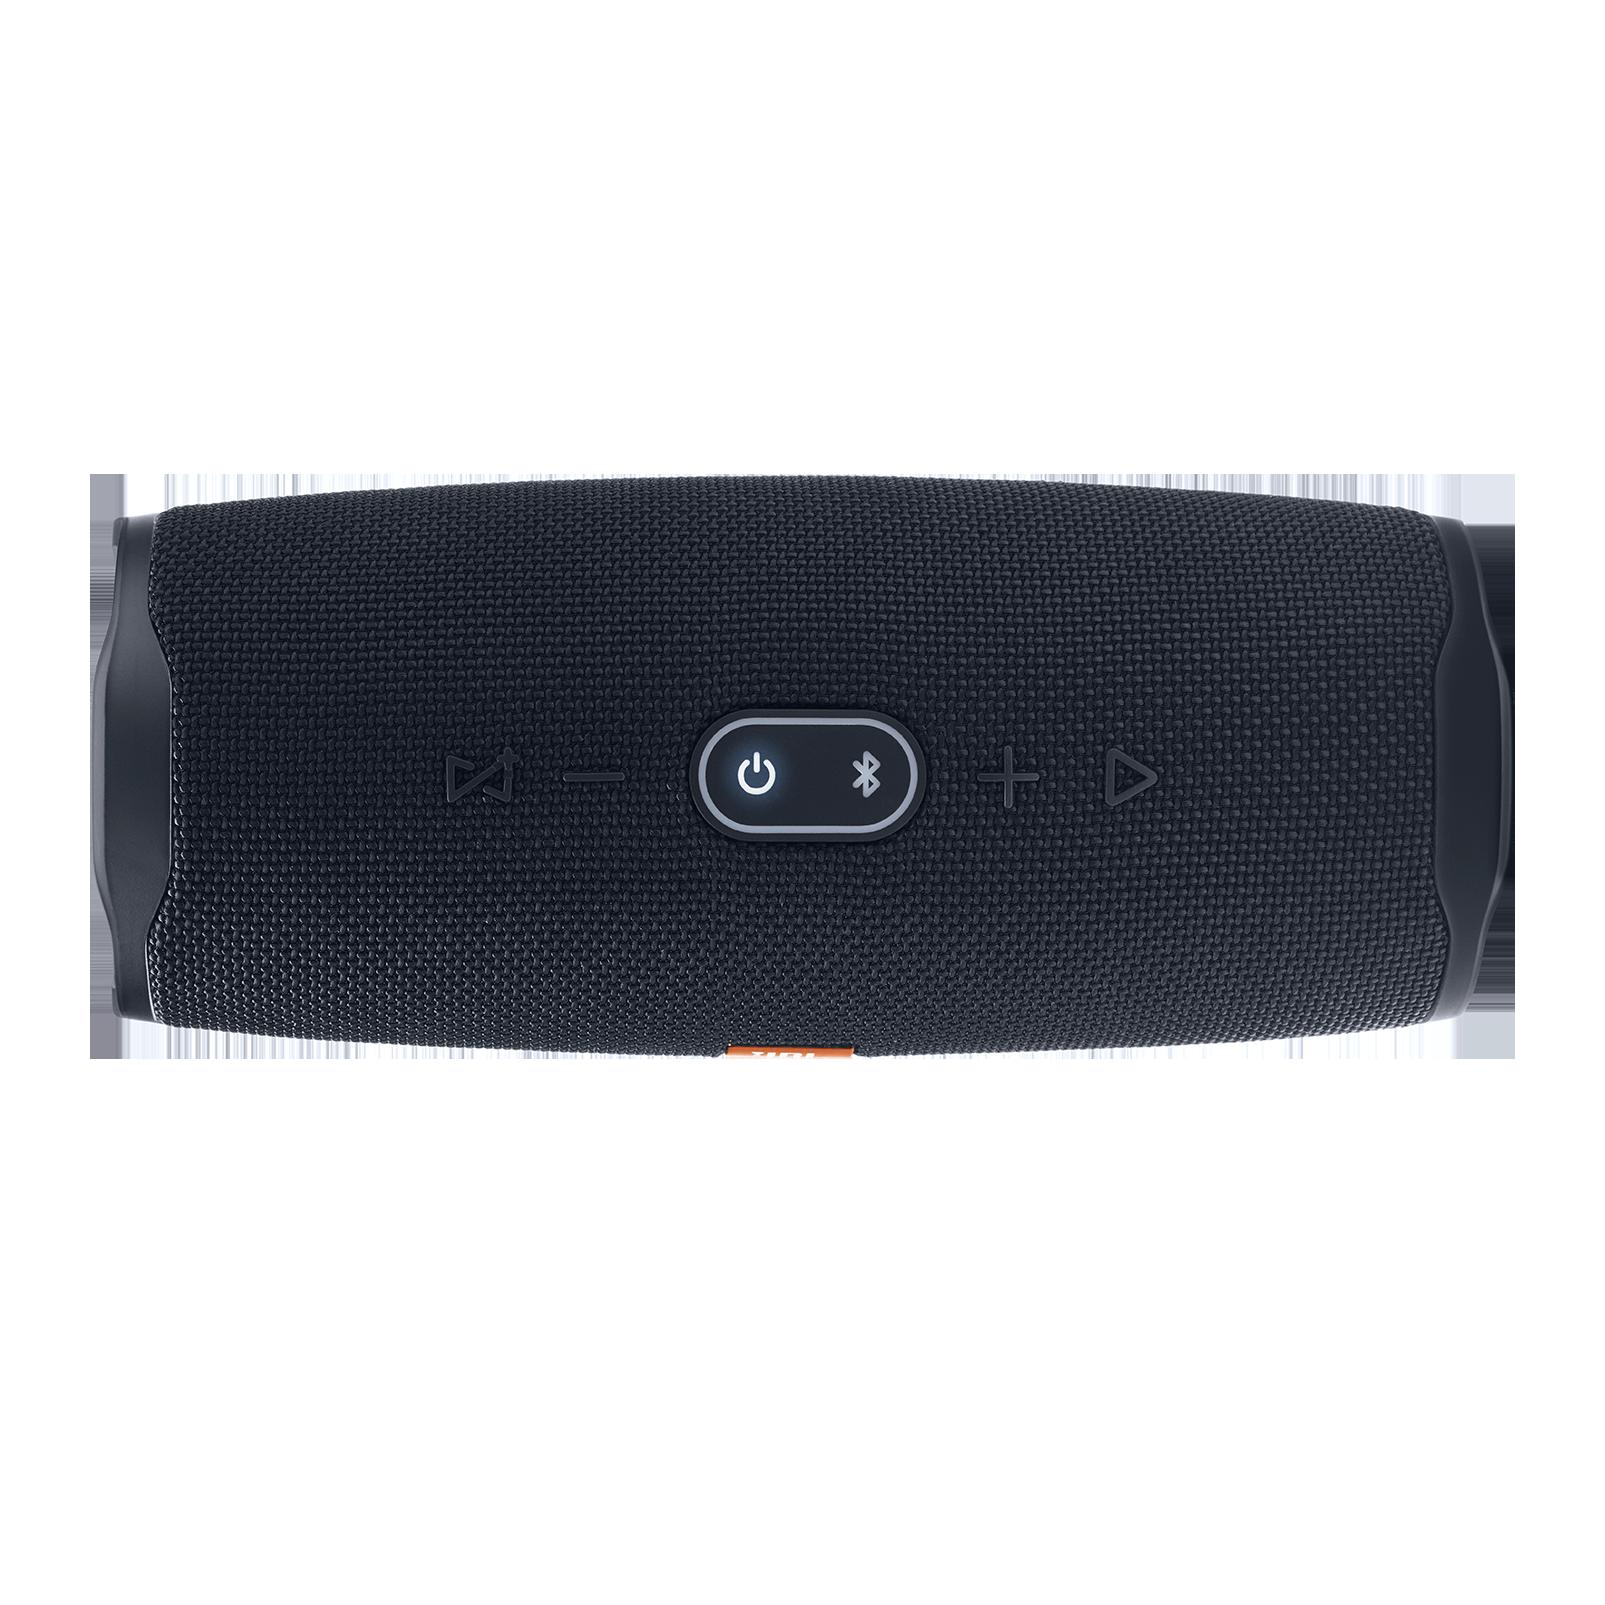 44da0276e62 JBL Charge 4 | Portable Bluetooth speaker